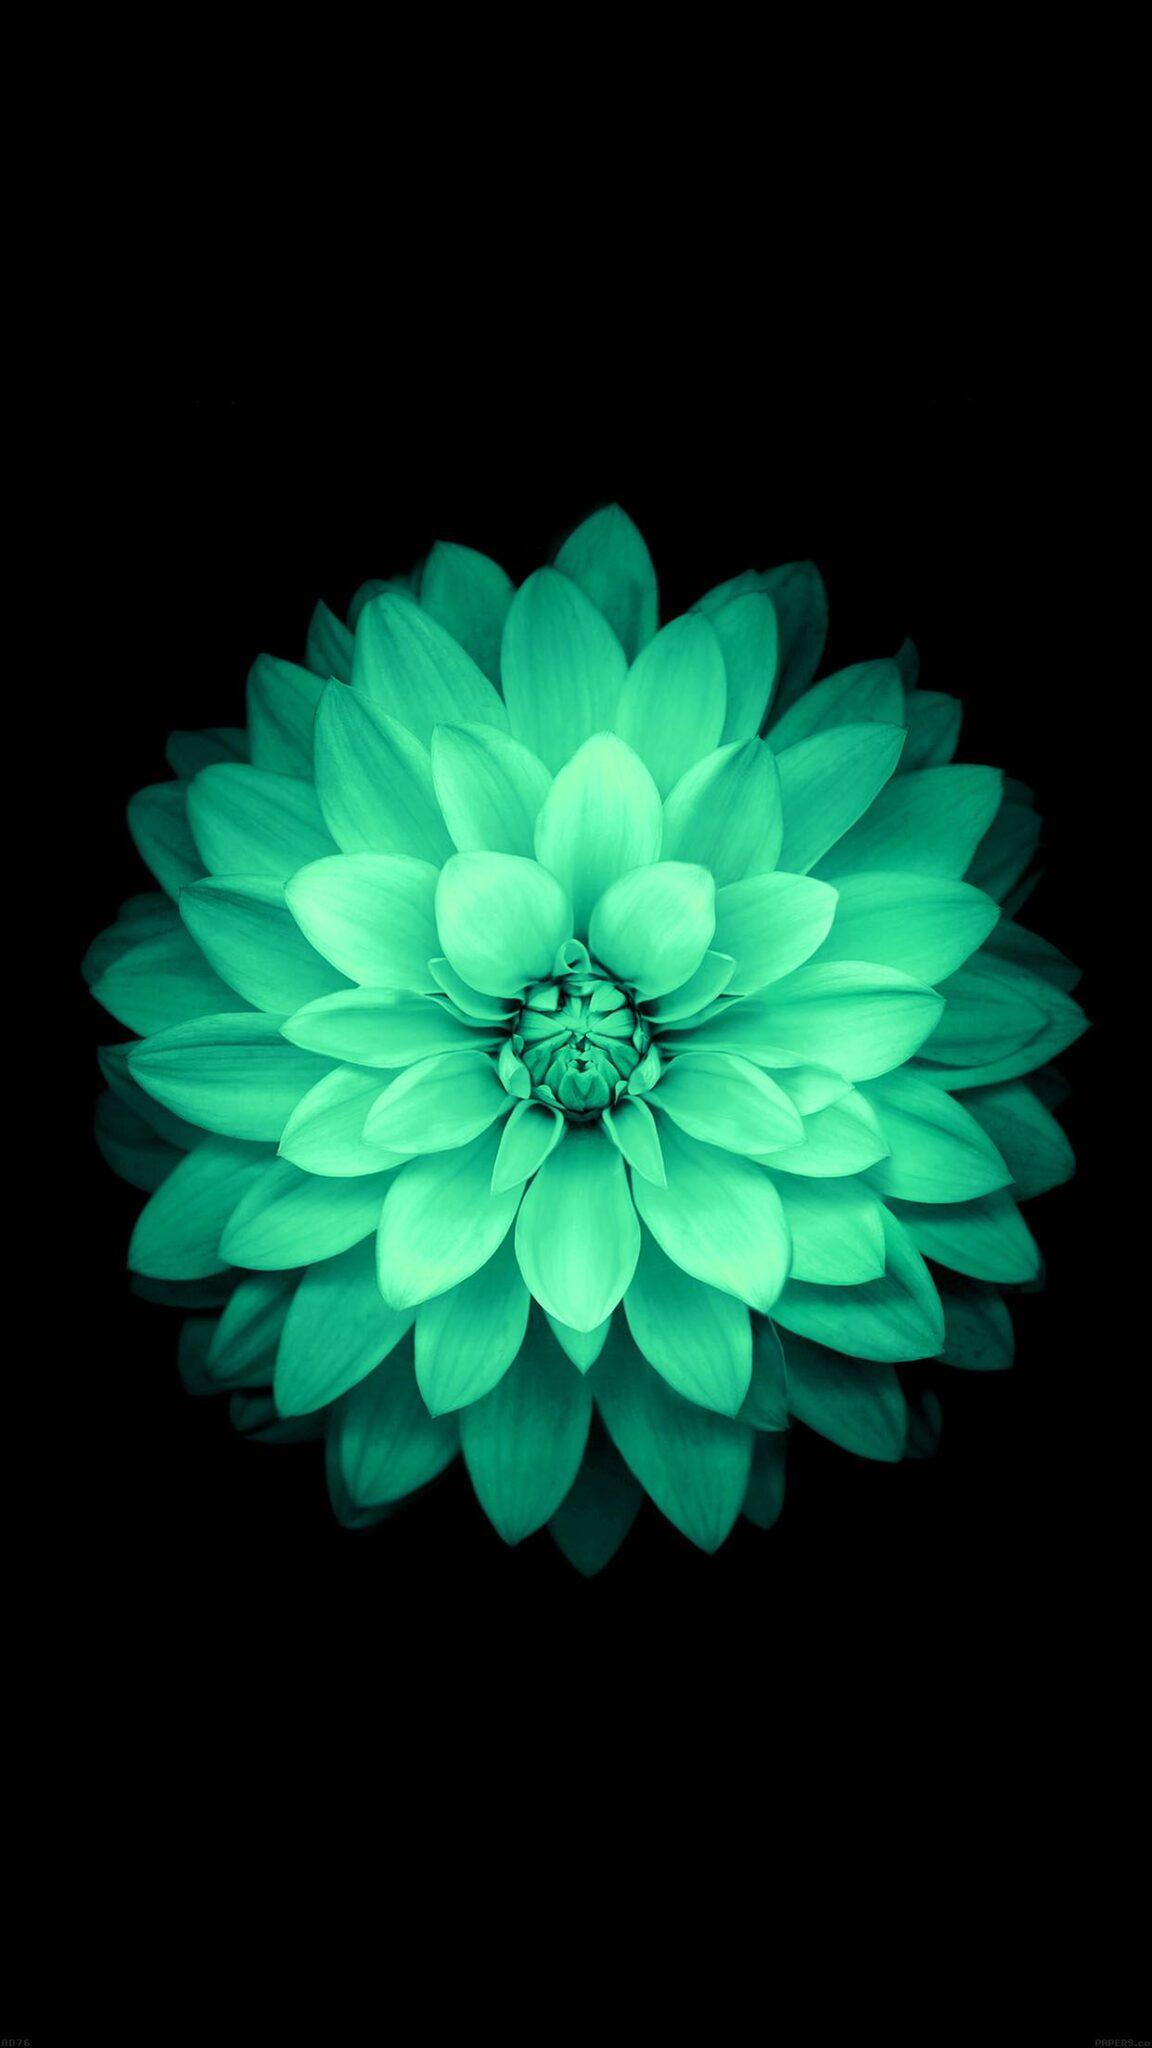 Fleur D Apple Fond D Ecran Android